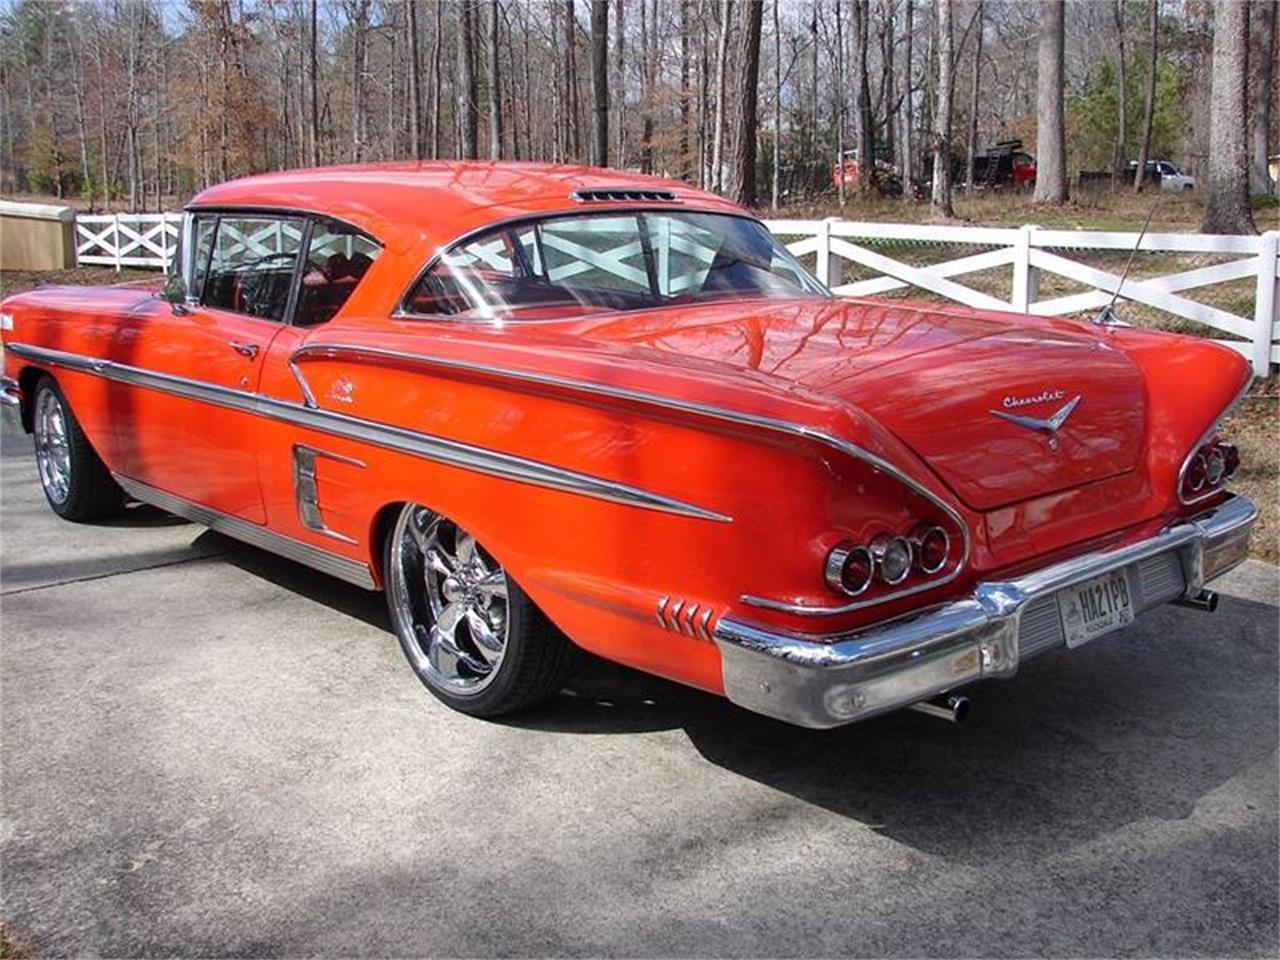 Large Picture of Classic '58 Impala - $49,500.00 - MG1I